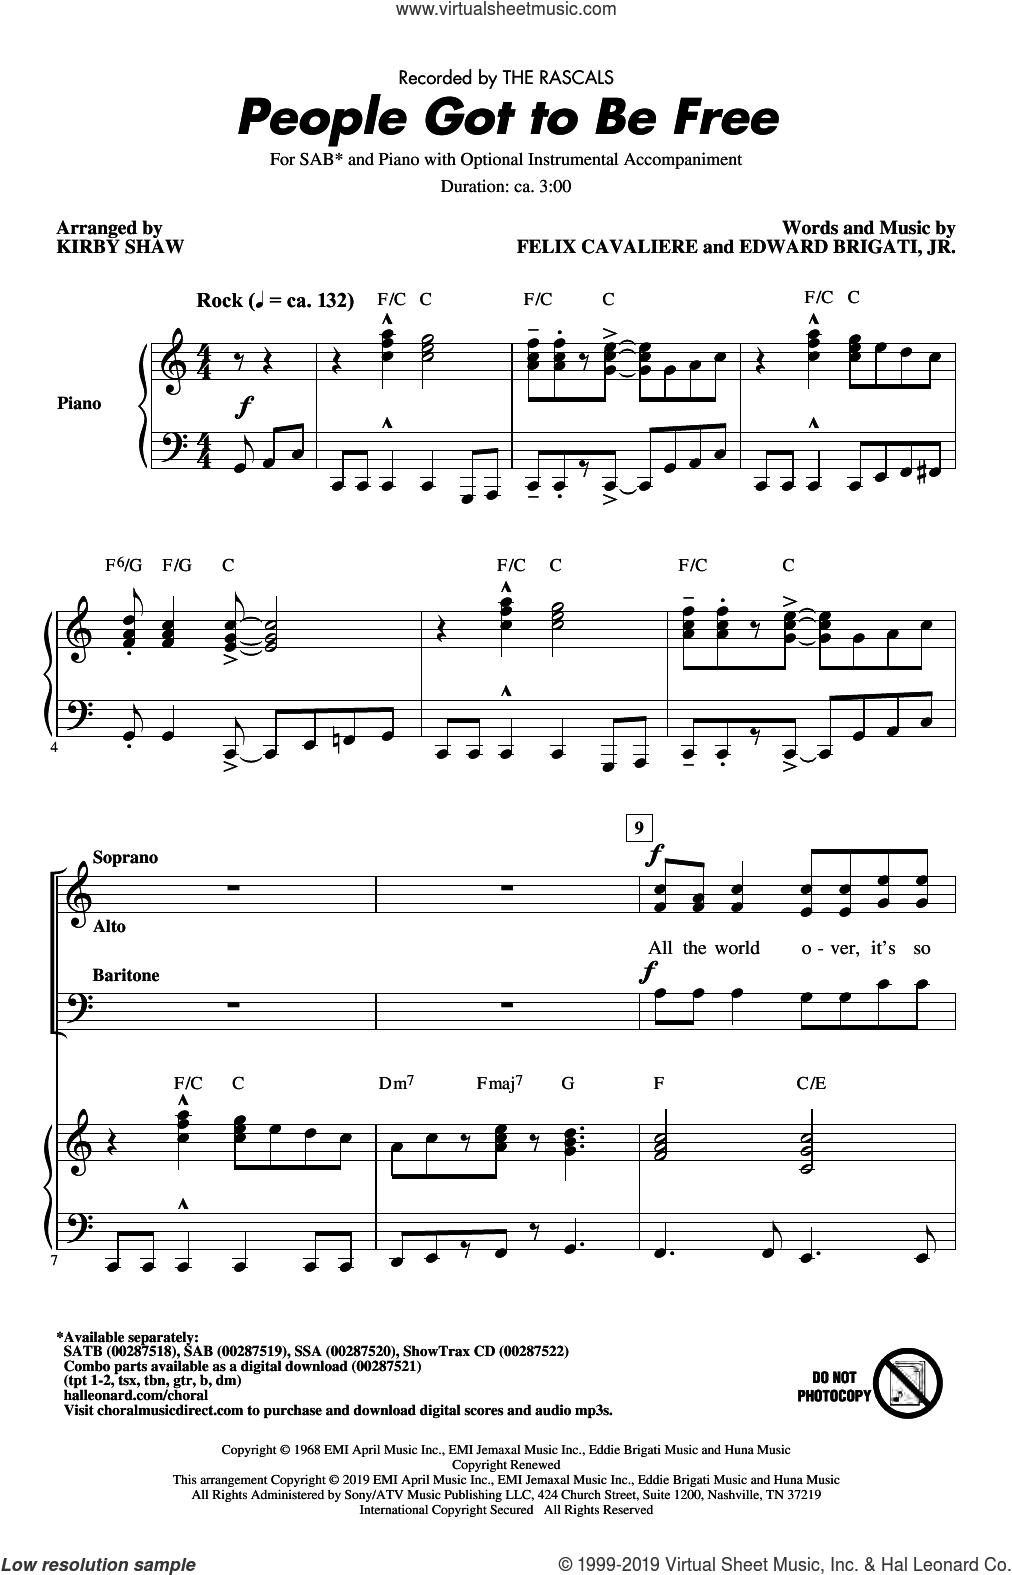 People Got To Be Free (arr. Kirby Shaw) sheet music for choir (SAB: soprano, alto, bass) by The Rascals, Kirby Shaw, Edward Brigati Jr. and Felix Cavaliere, intermediate skill level